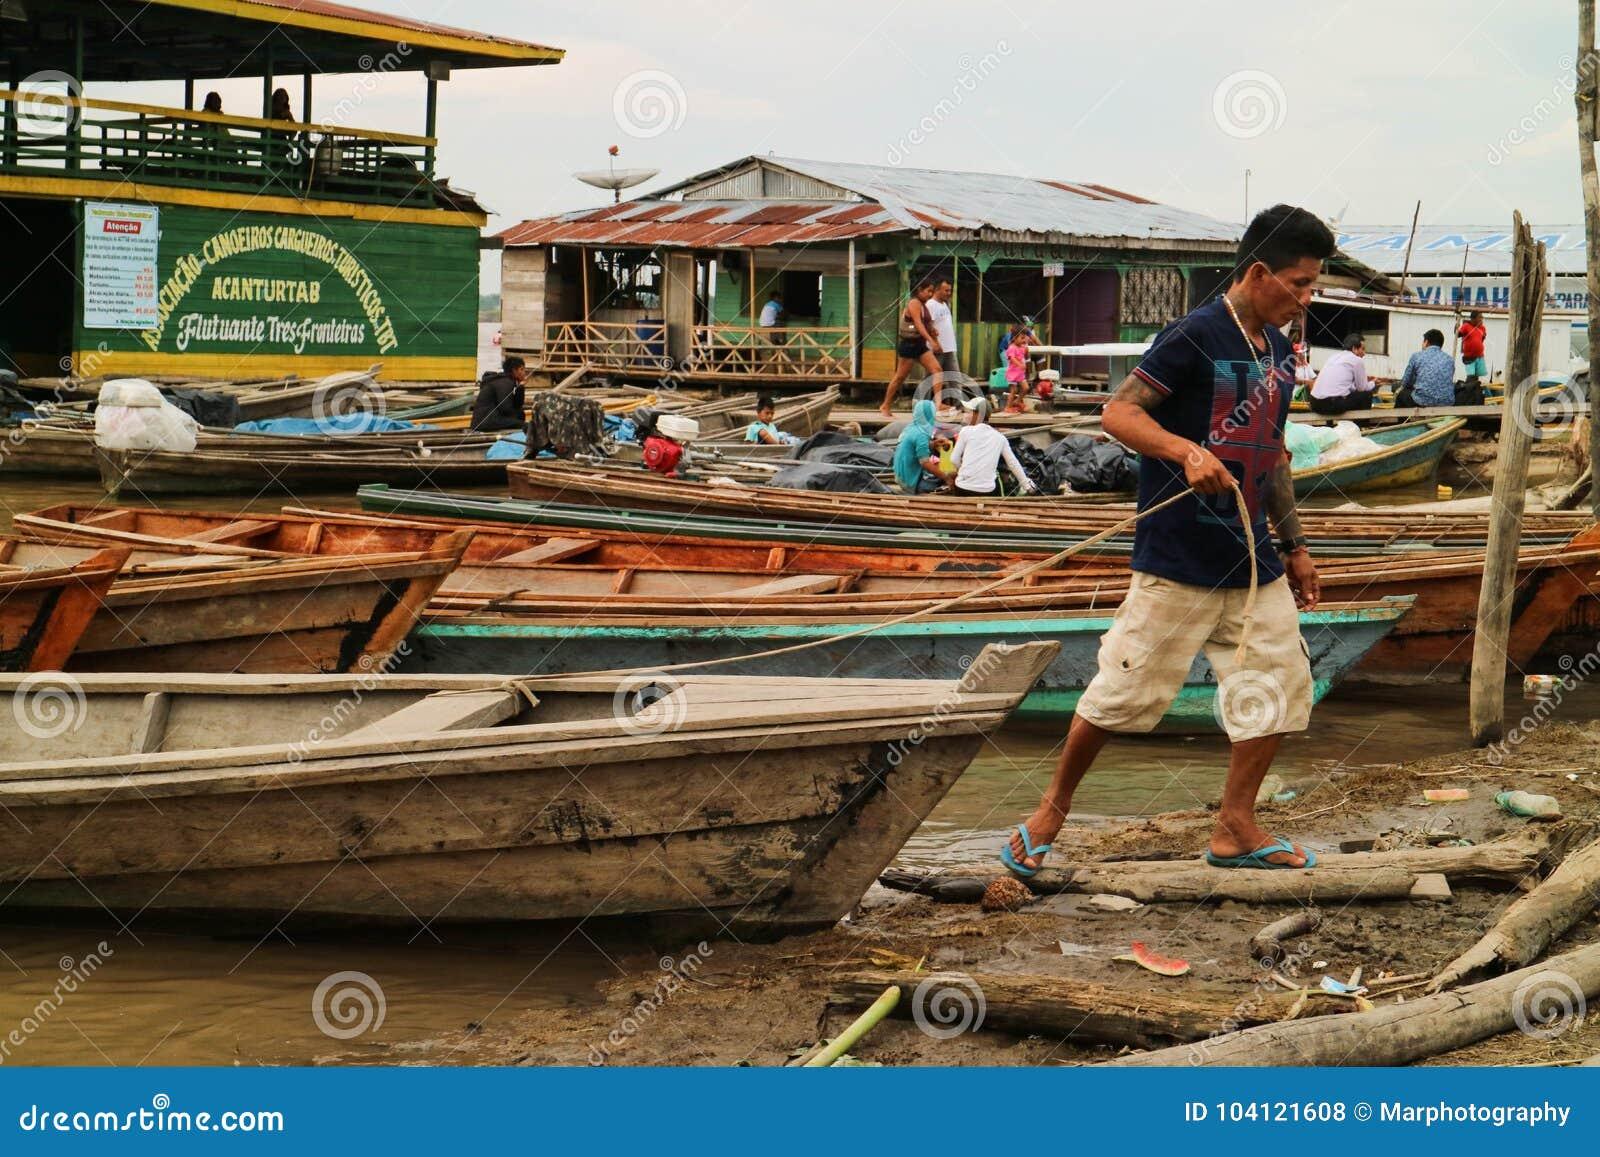 Wooden canoe in river port